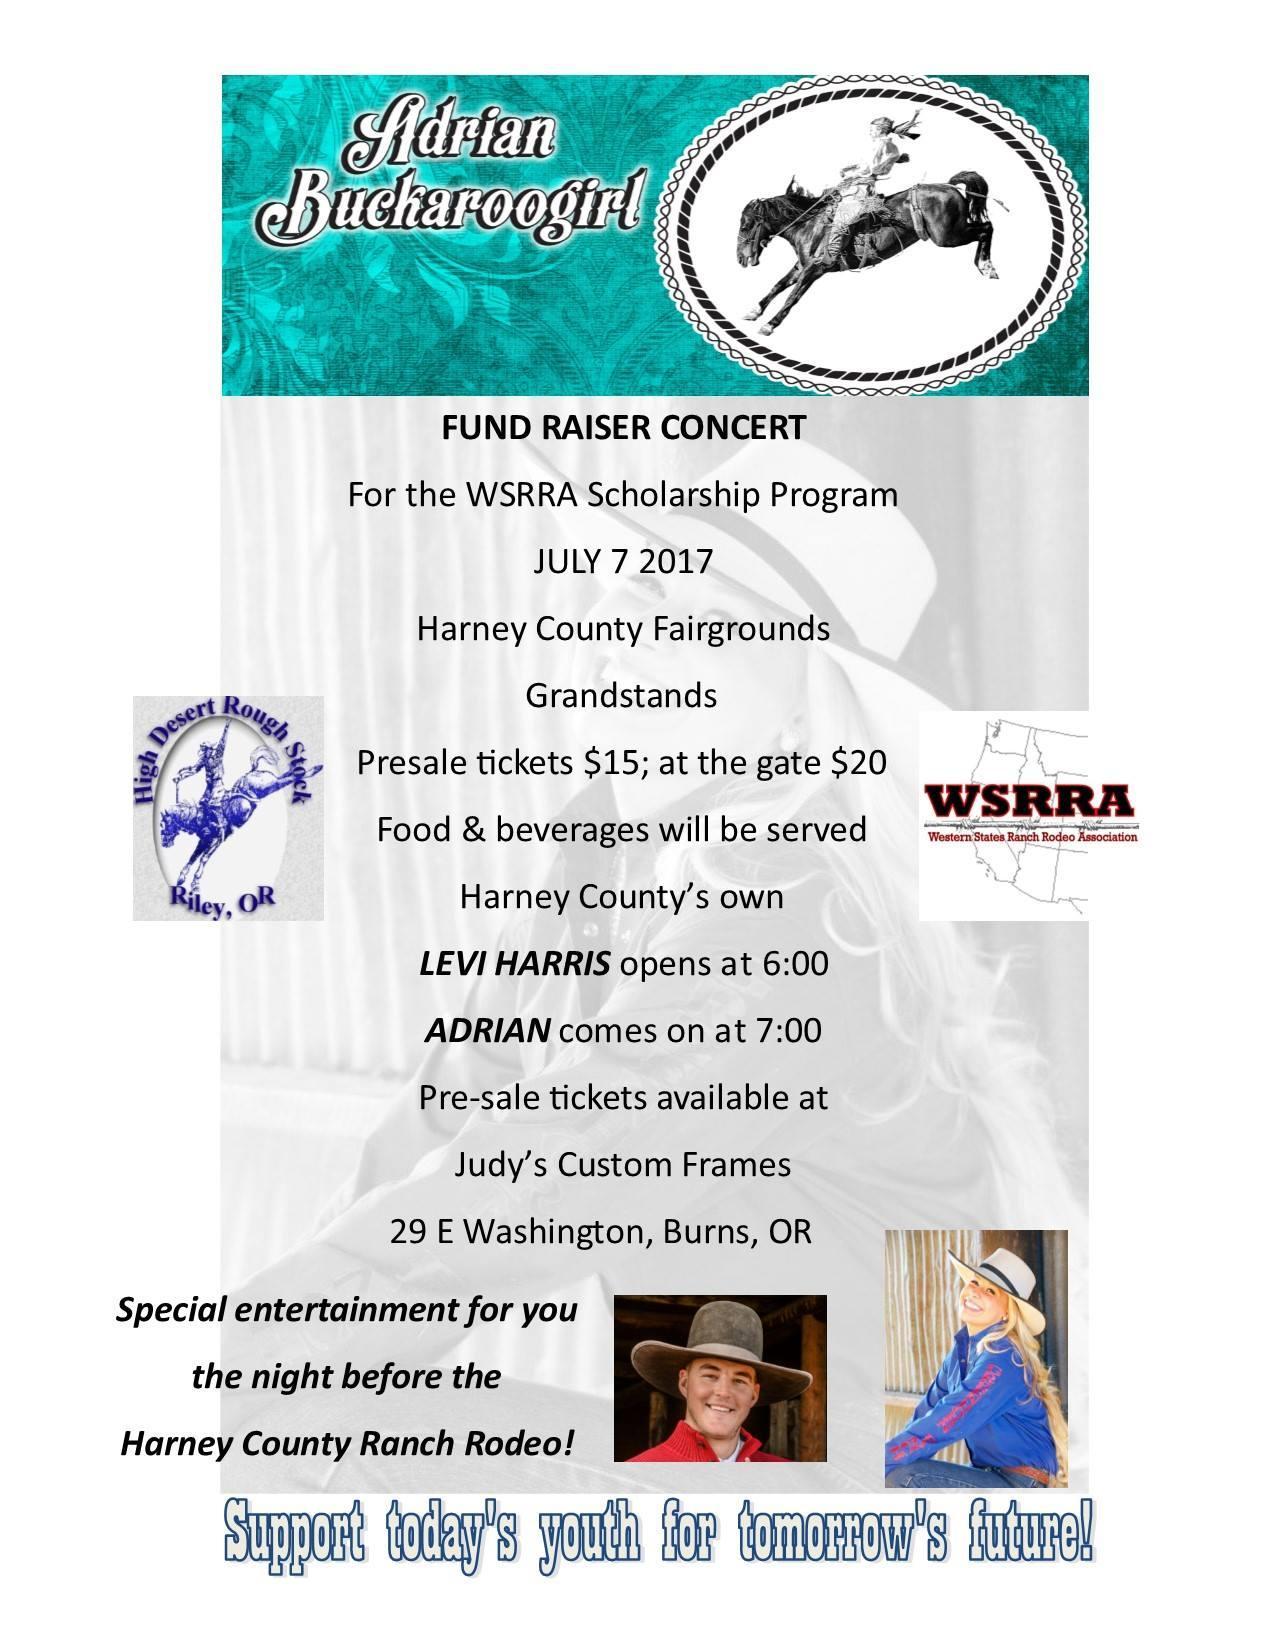 WSRRA Scholarship Program Fund Raiser Concert Tickets in Burns, OR ...